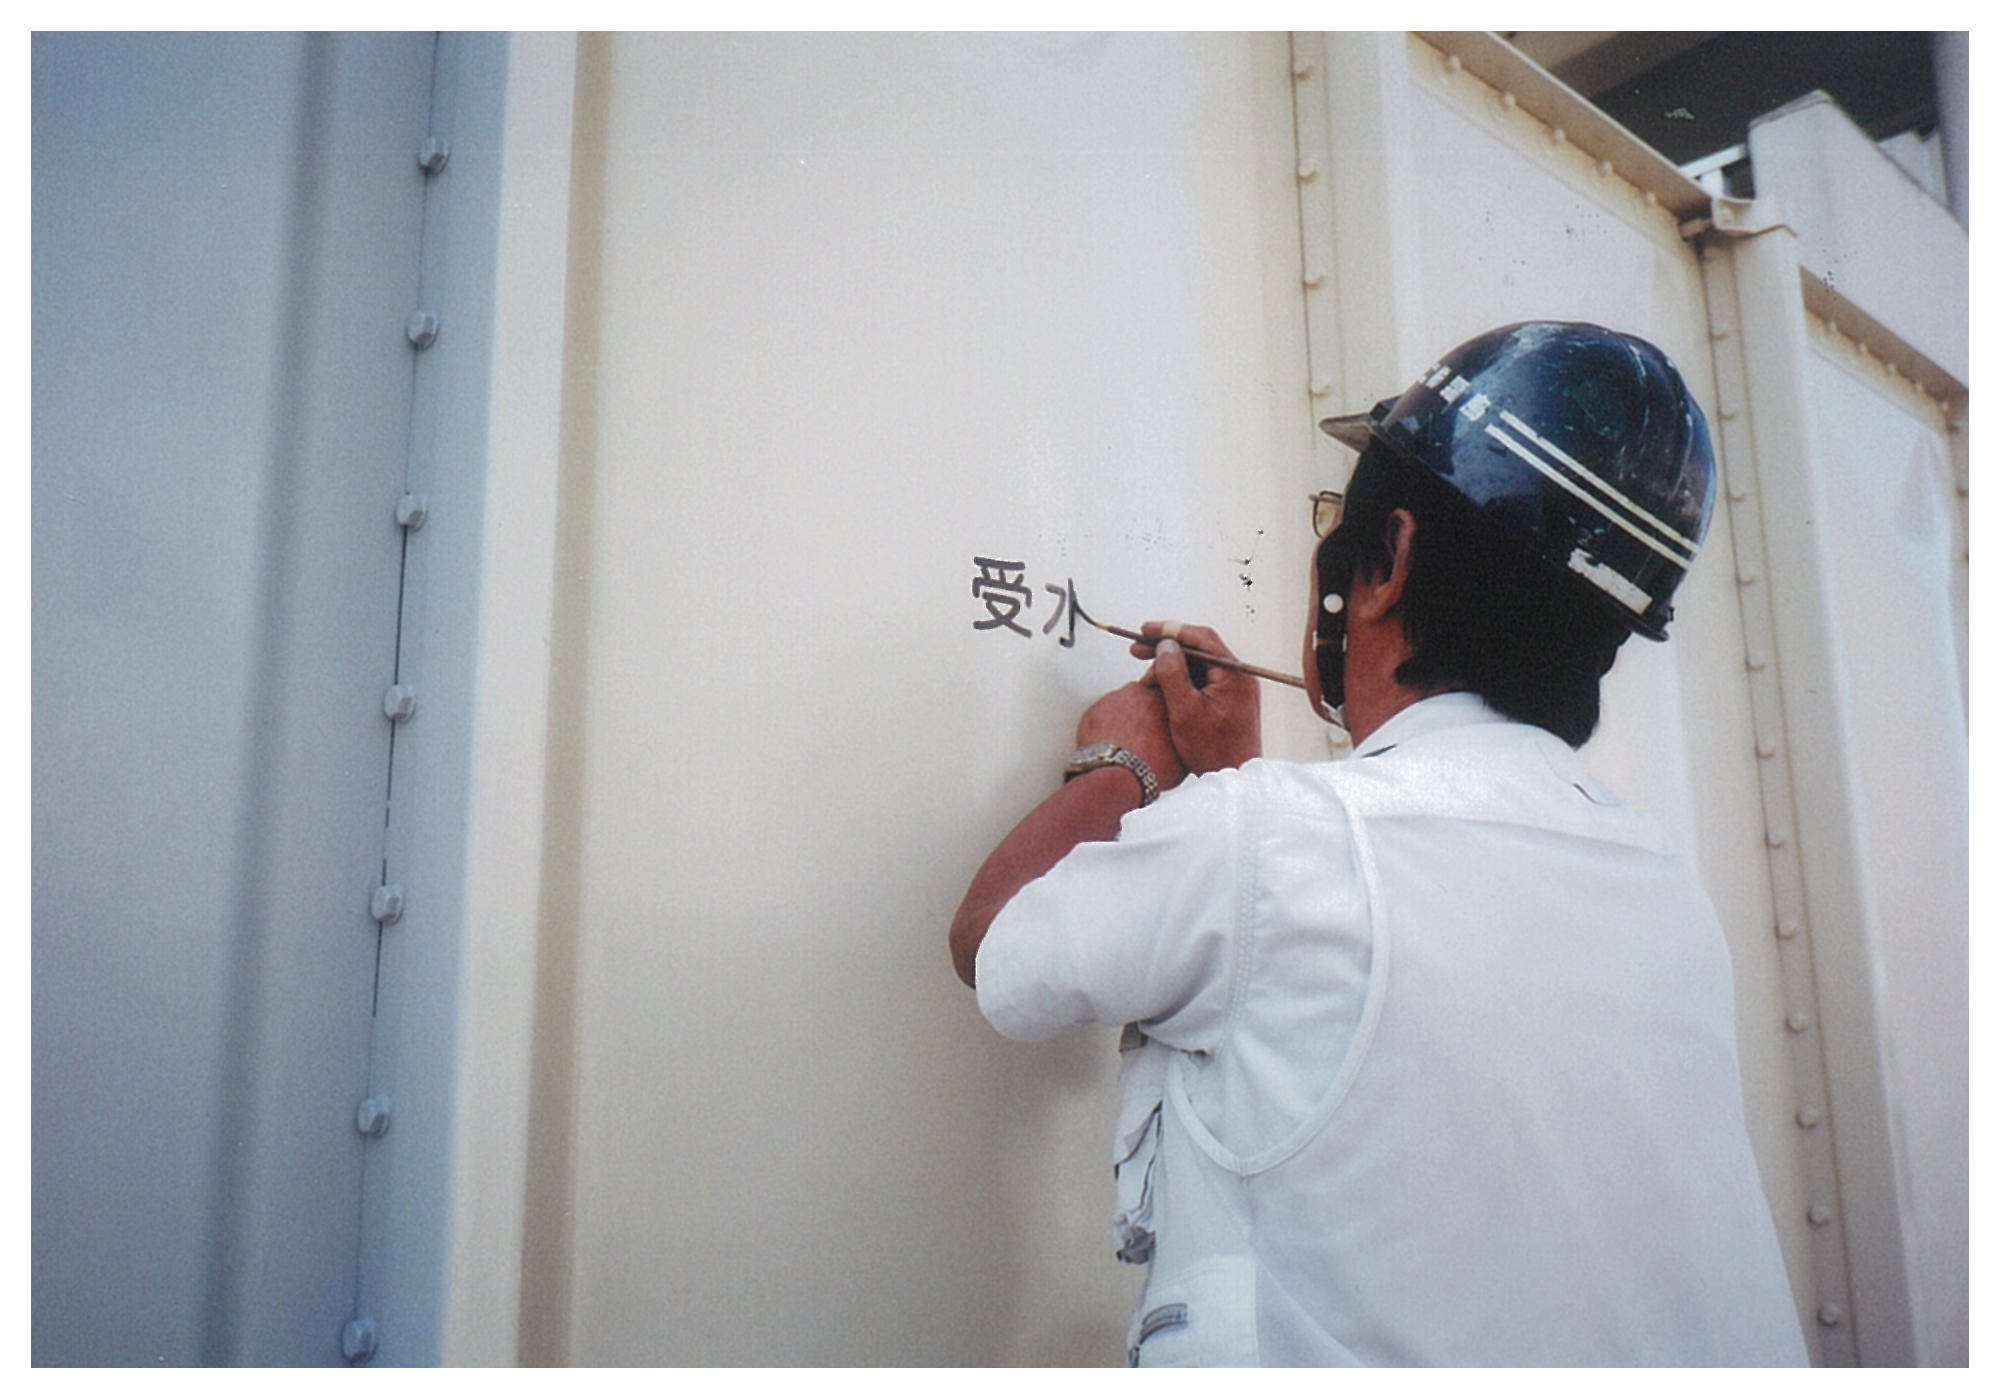 伊那中央衛生センター受水槽防水工事